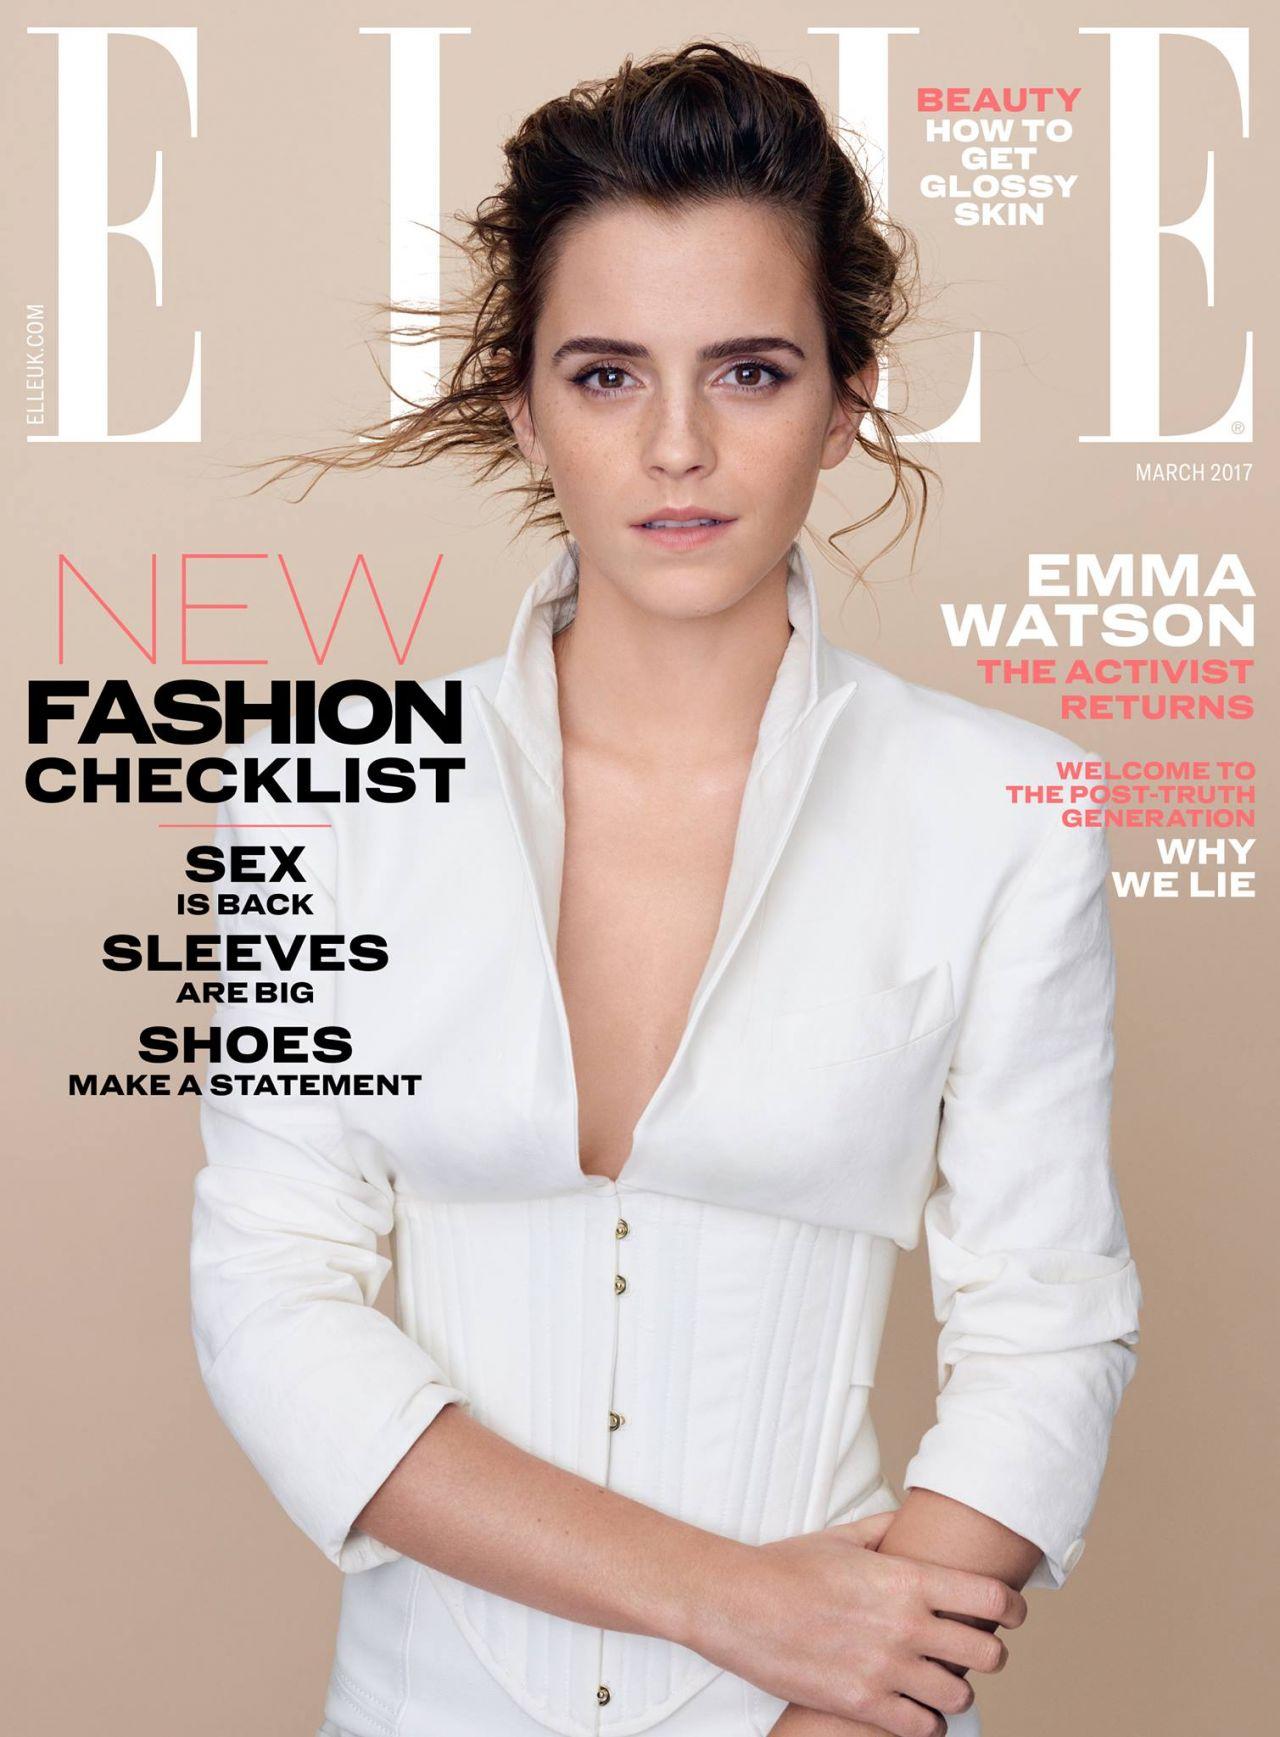 Emma Watson Covers ELLE UK Magazine March 2017 ...